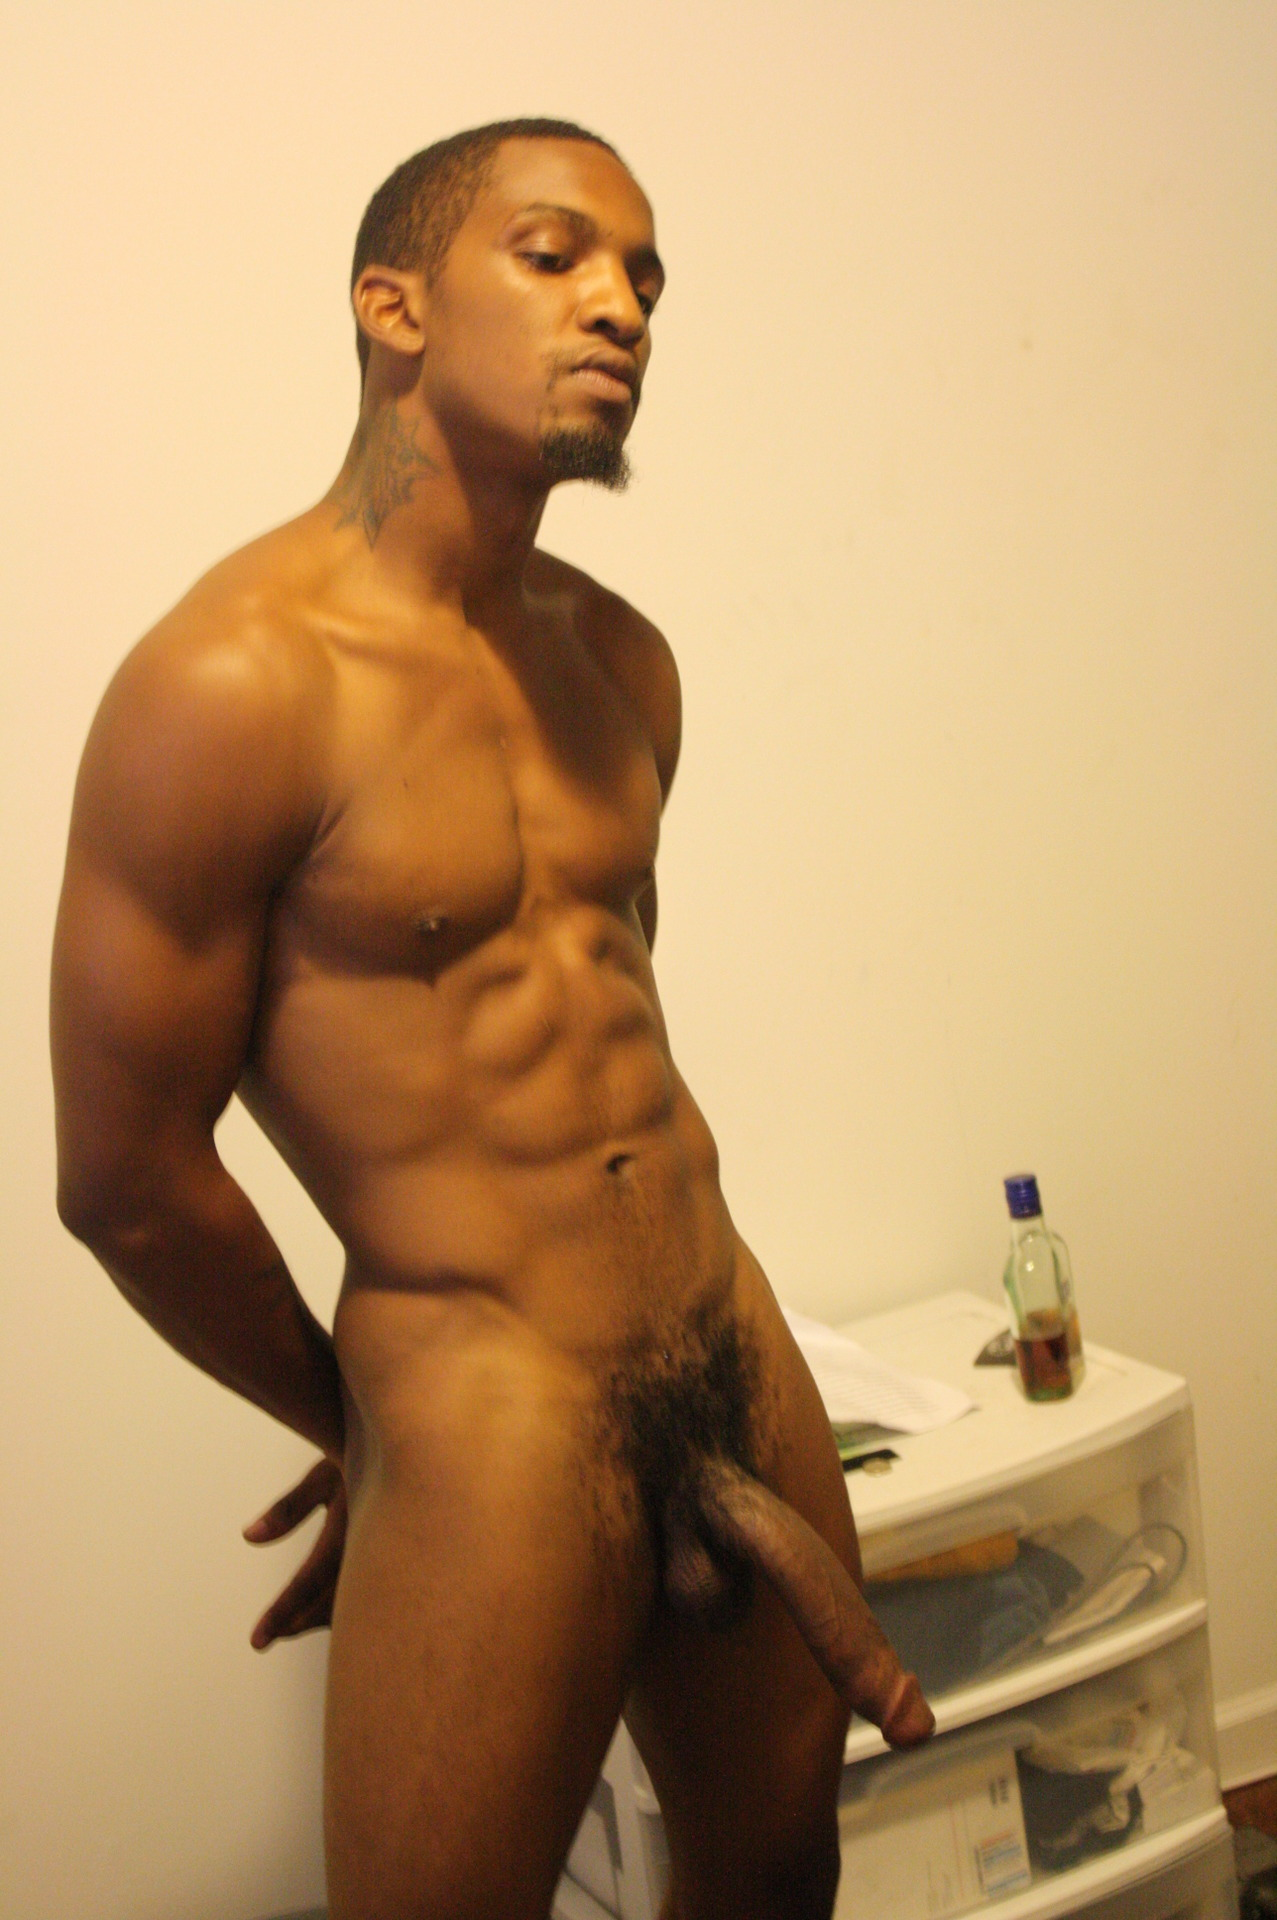 black guys with big penis naked fuckbook - aise